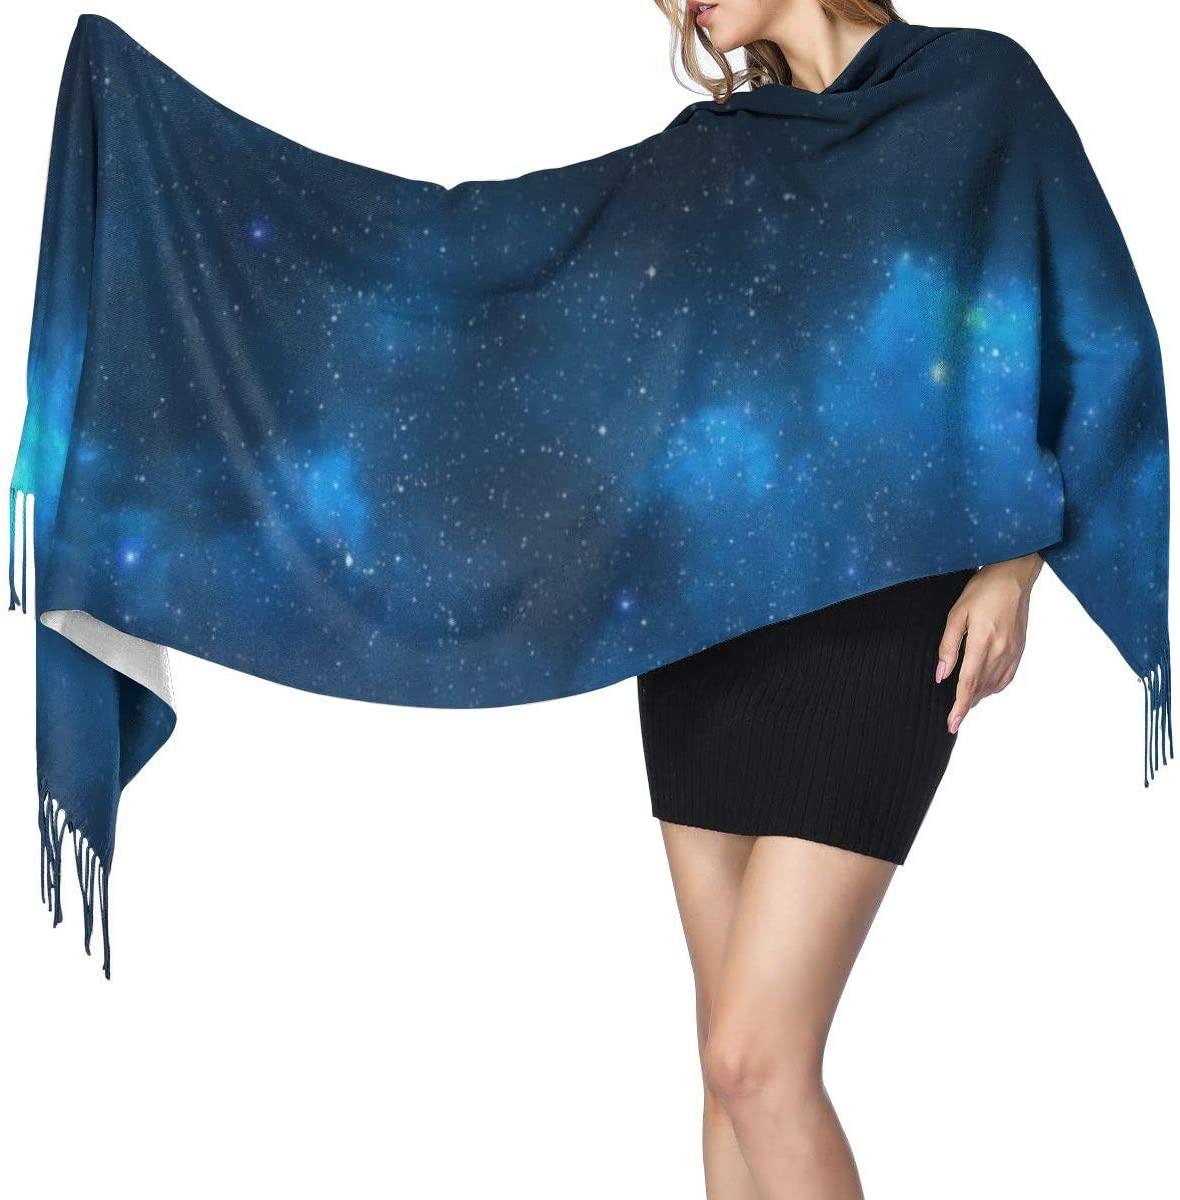 NOT Starry Sky Fashion Long Large Soft Cashmere Shawl Wrap Imitation Cashmere